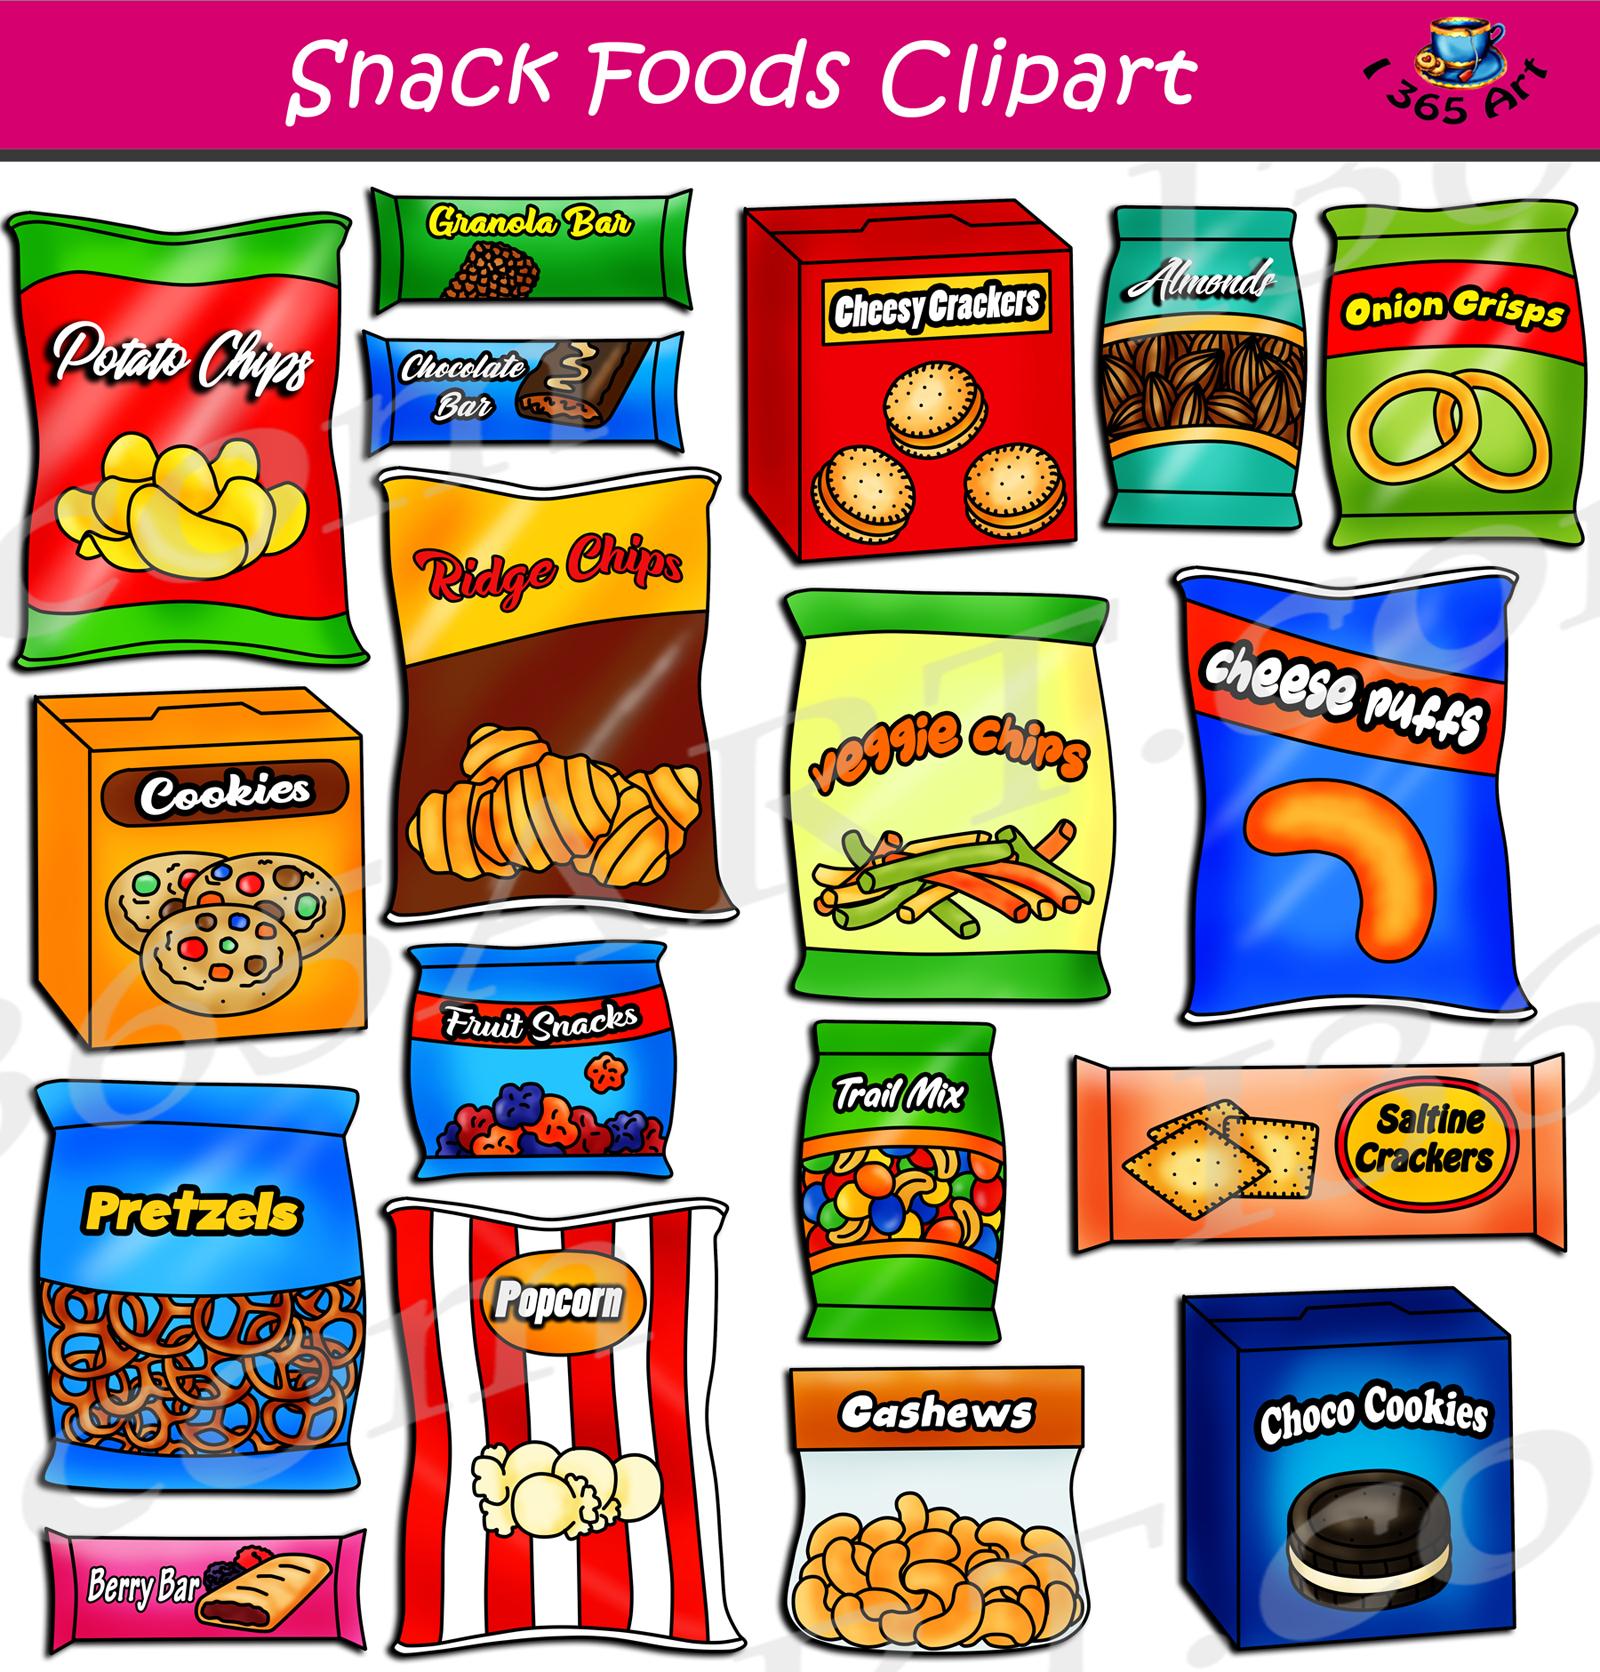 Food clipart snack. Foods set download